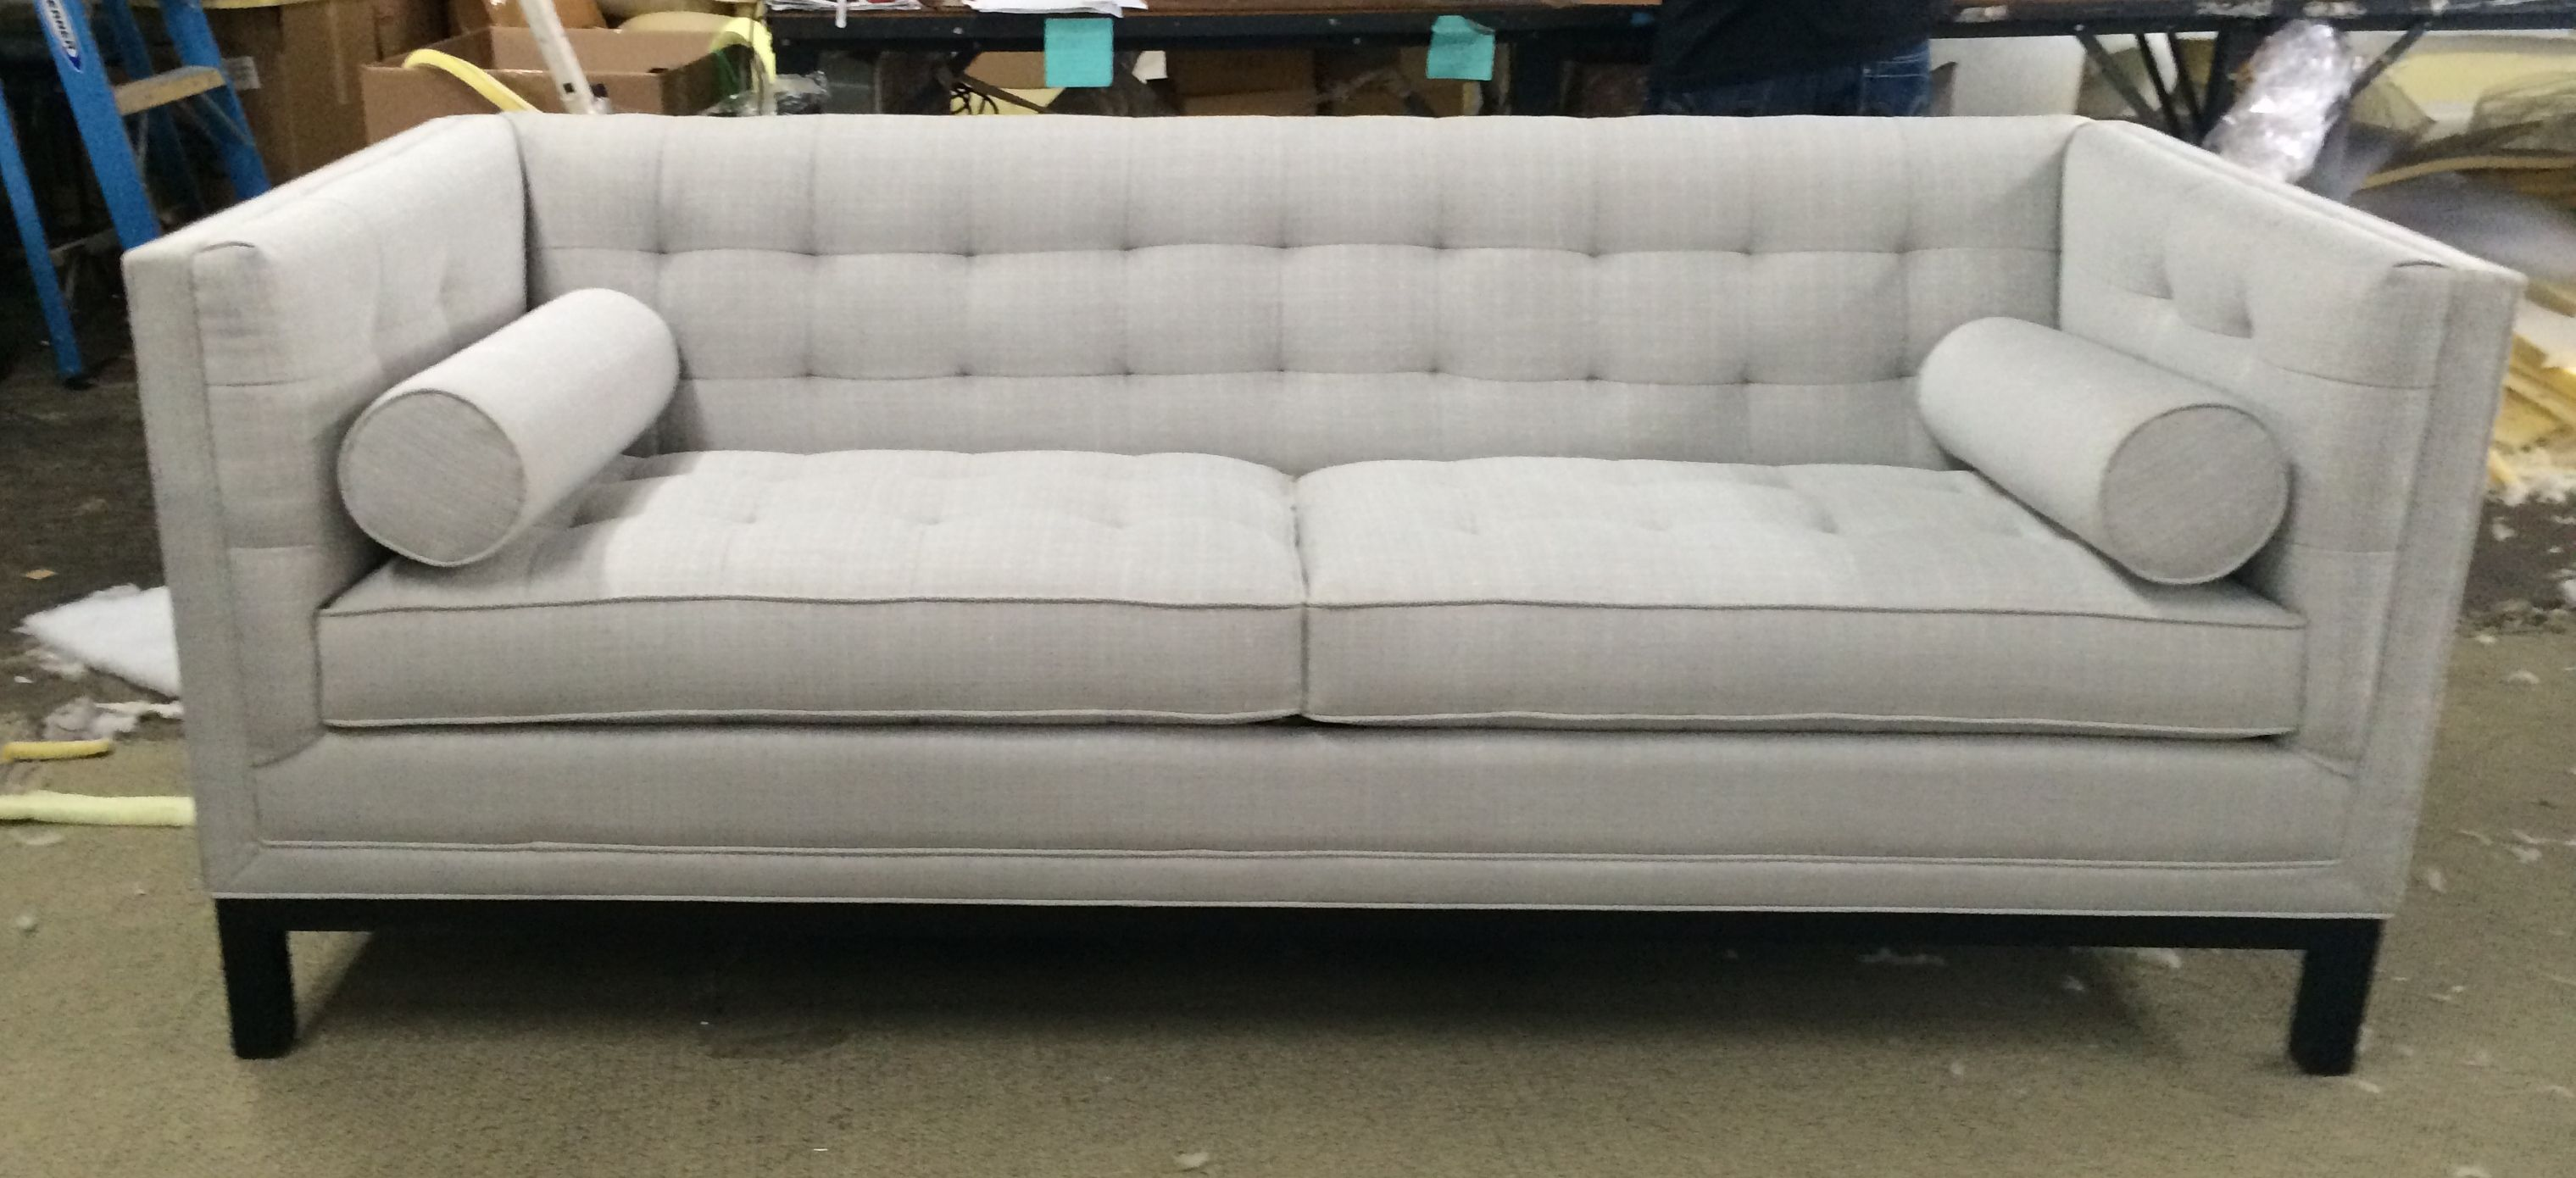 houzz sofas ashley axiom leather sofa monarch review home co